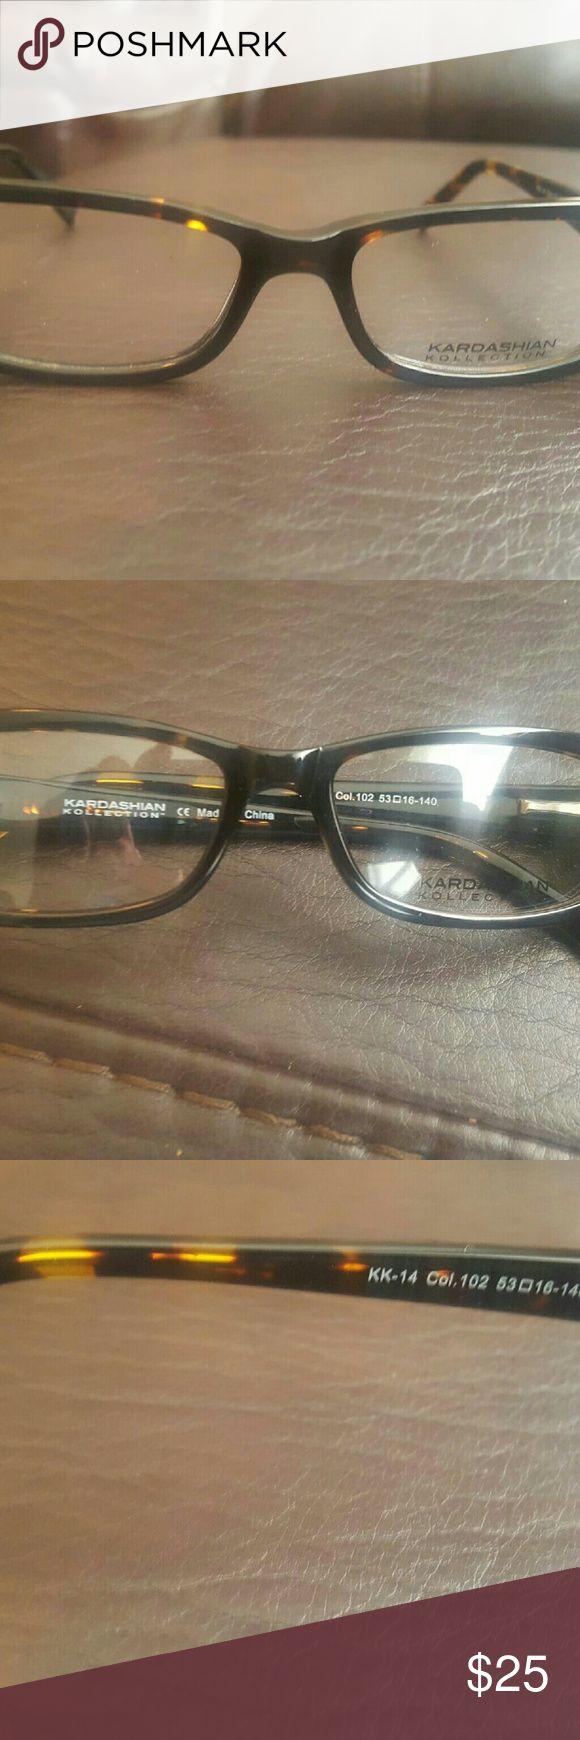 Kardashian Kollection Glasses Brand new non prescription Kardashian Kollection Glasses. Comes with demo lens.   NWOT Kardashian Kollection Accessories Glasses